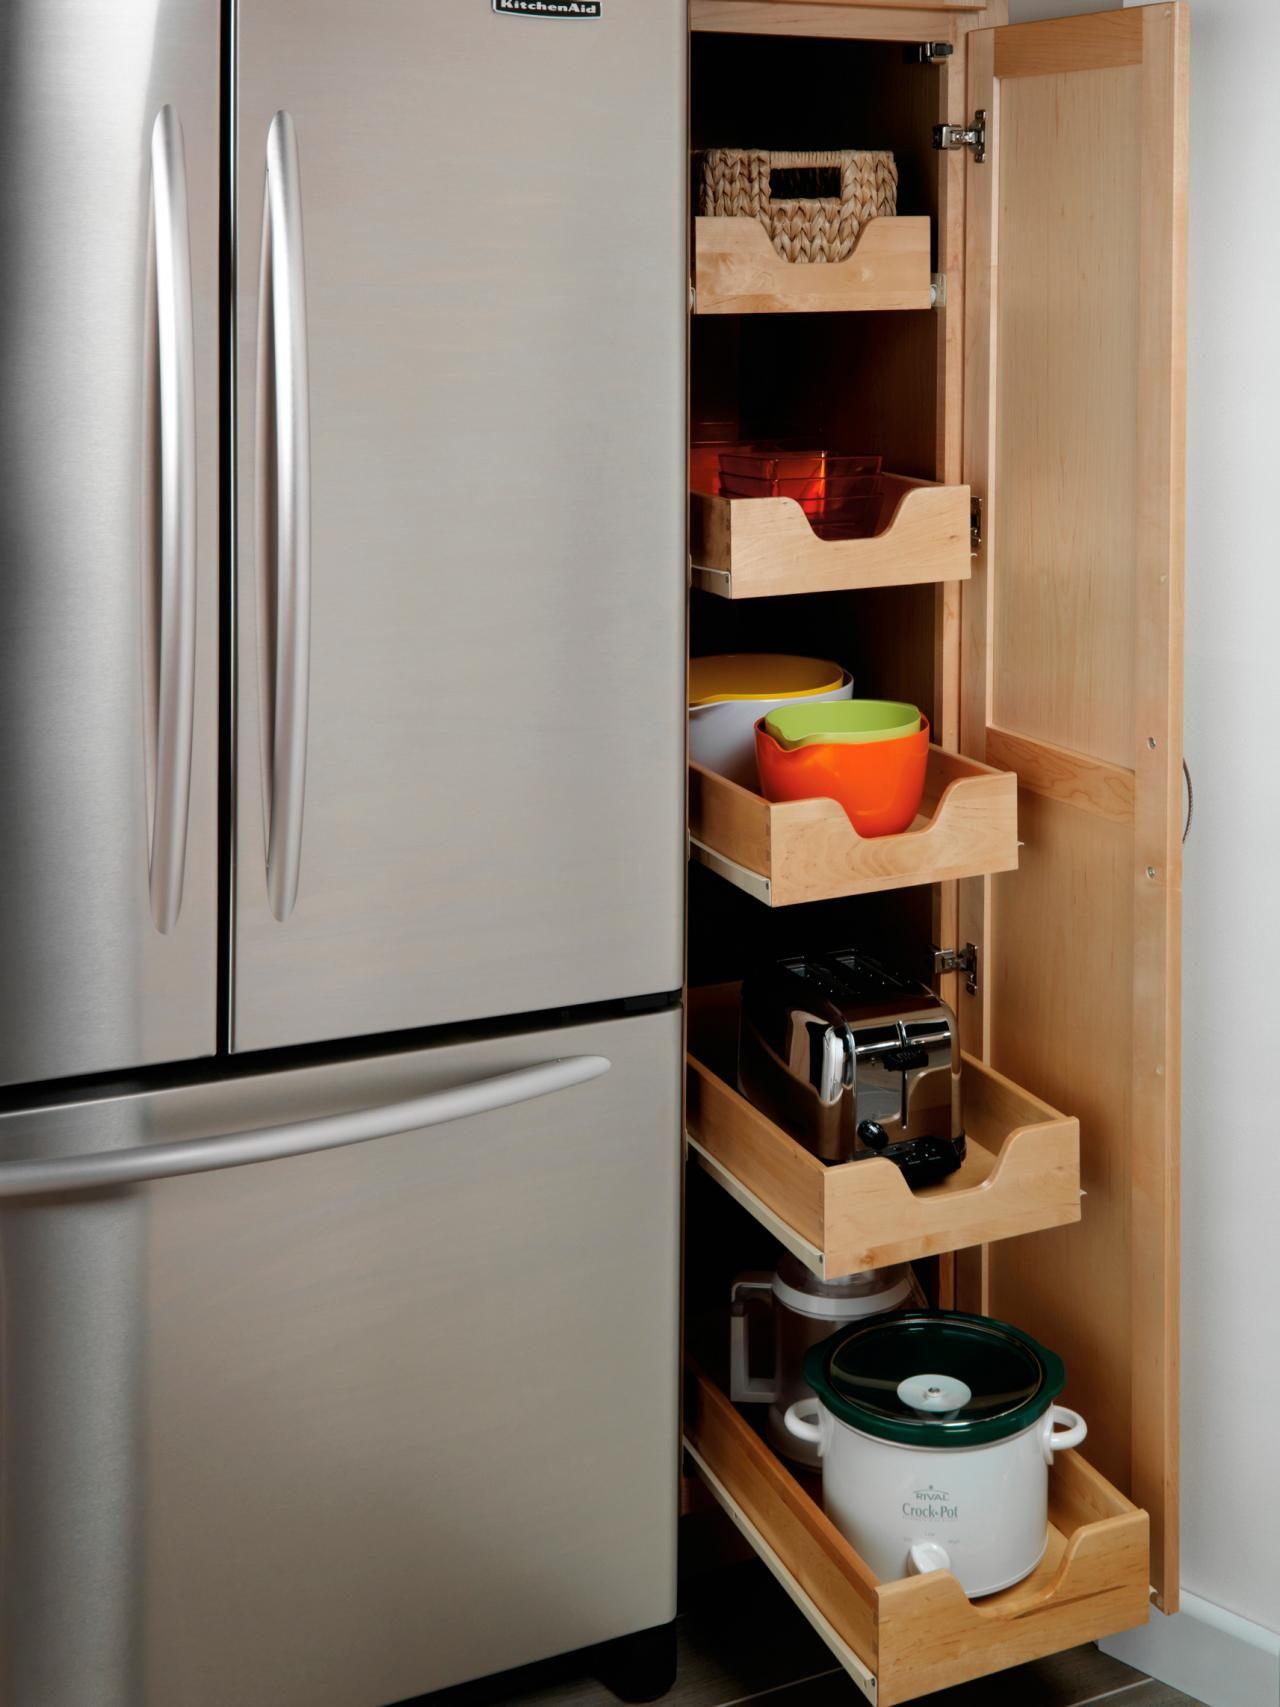 Хранение на кухне u задача не из лёгких Кухня pinterest